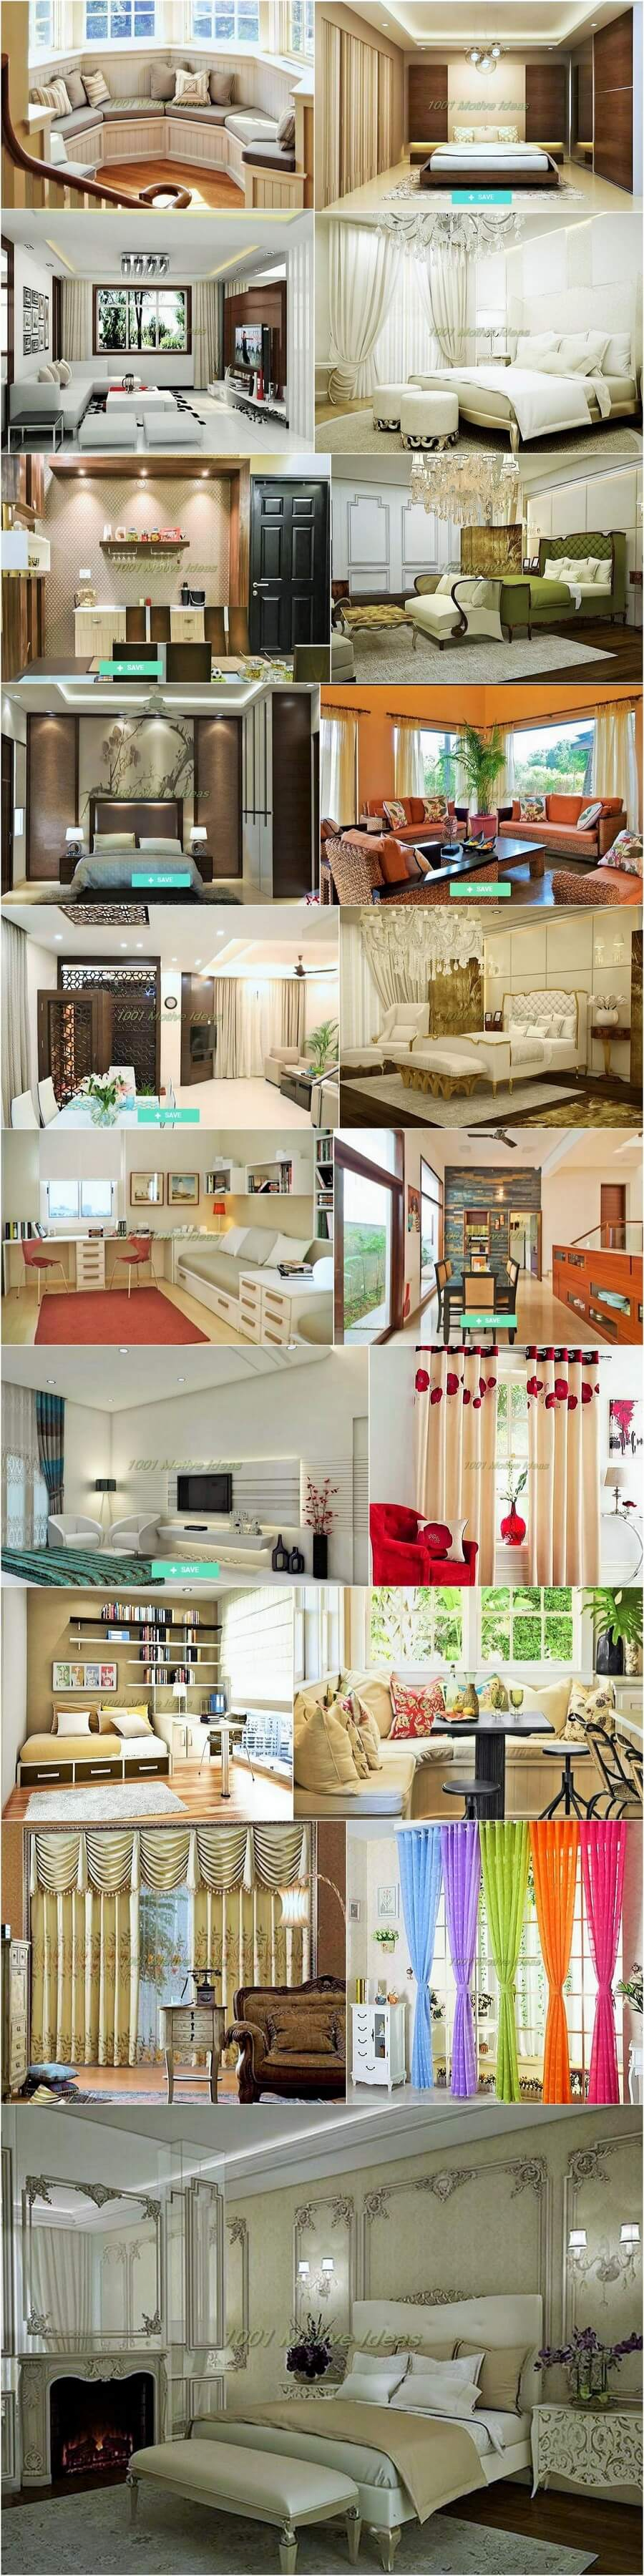 DIY-Modern living room photos living room Ideas (2)